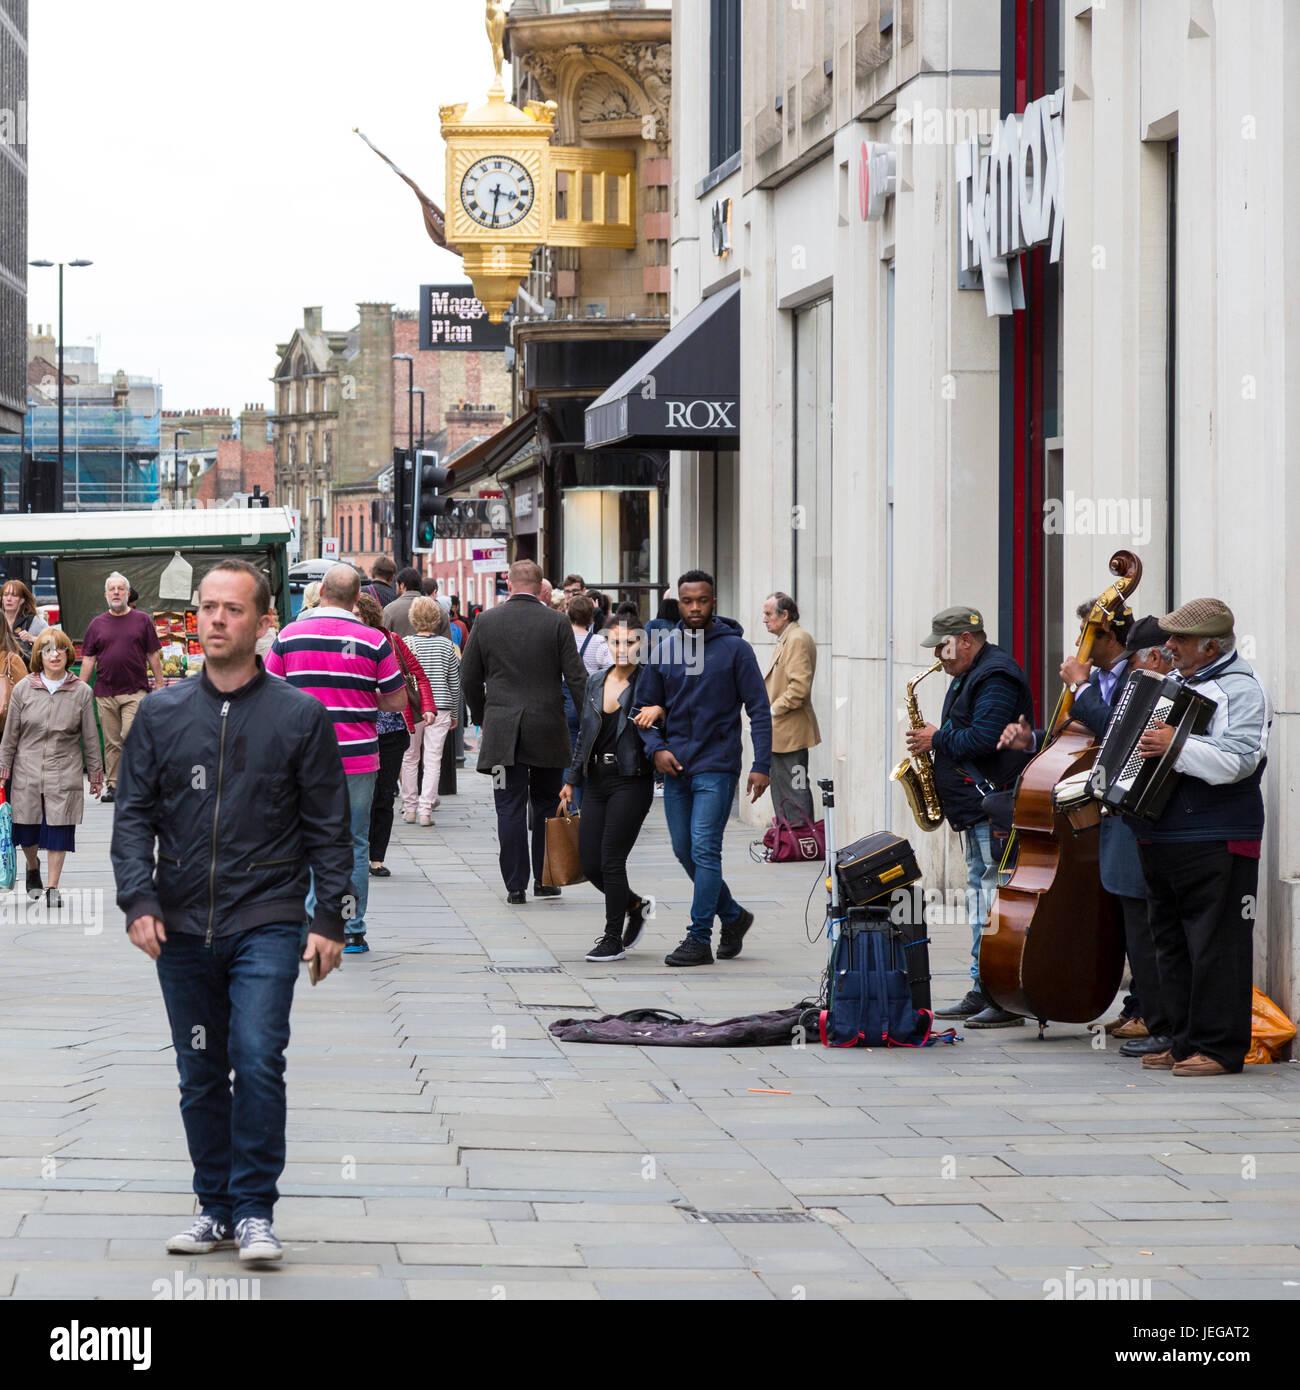 Newcastle-upon-Tyne, Inglaterra, Reino Unido. Northumberland Street Scene con músicos y peatones. Imagen De Stock